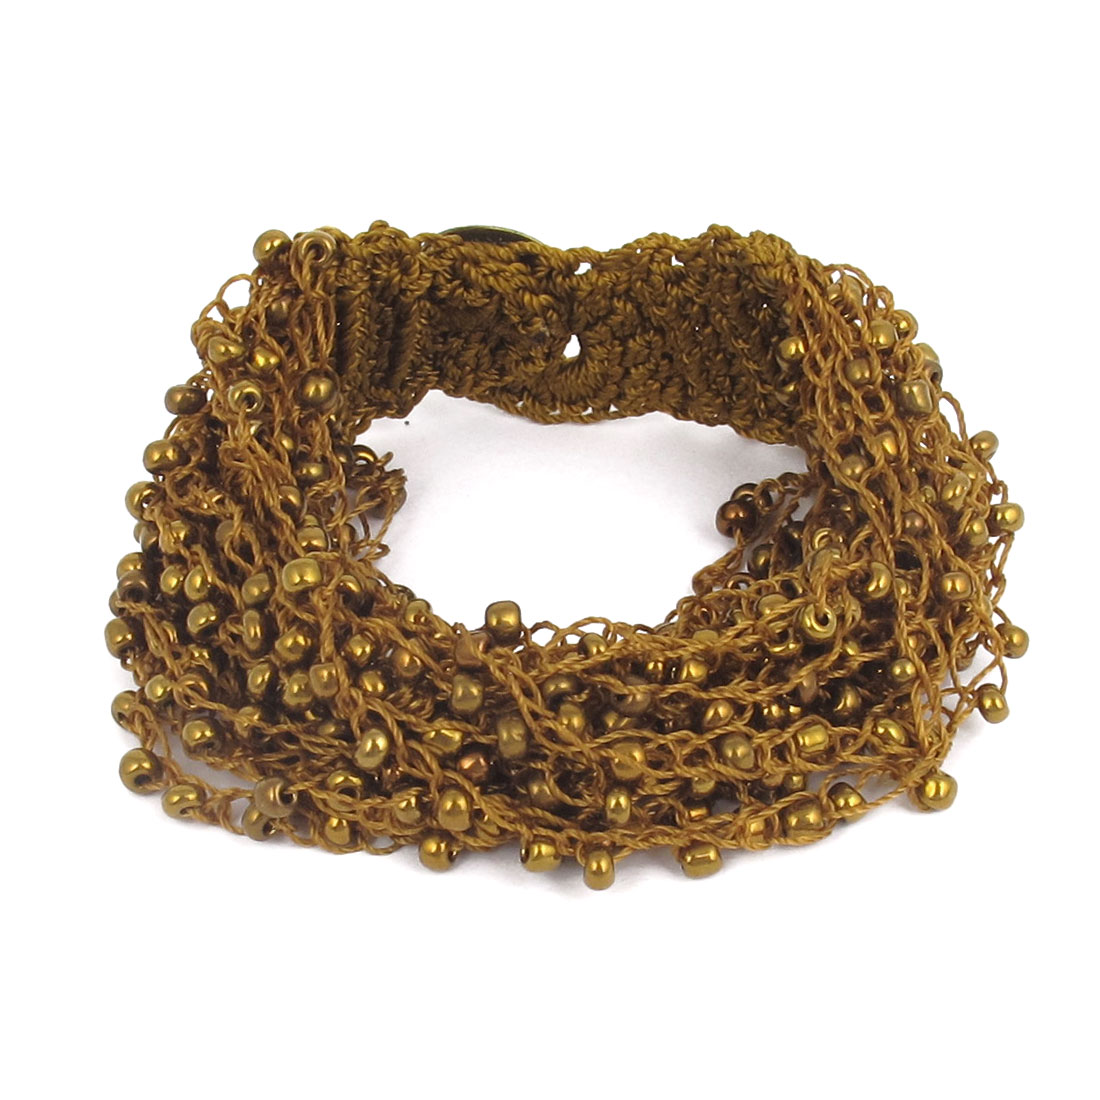 Women National Style Plastic Beaded Multi-layer Buttoned Bangle Bracelet Bronze Tone